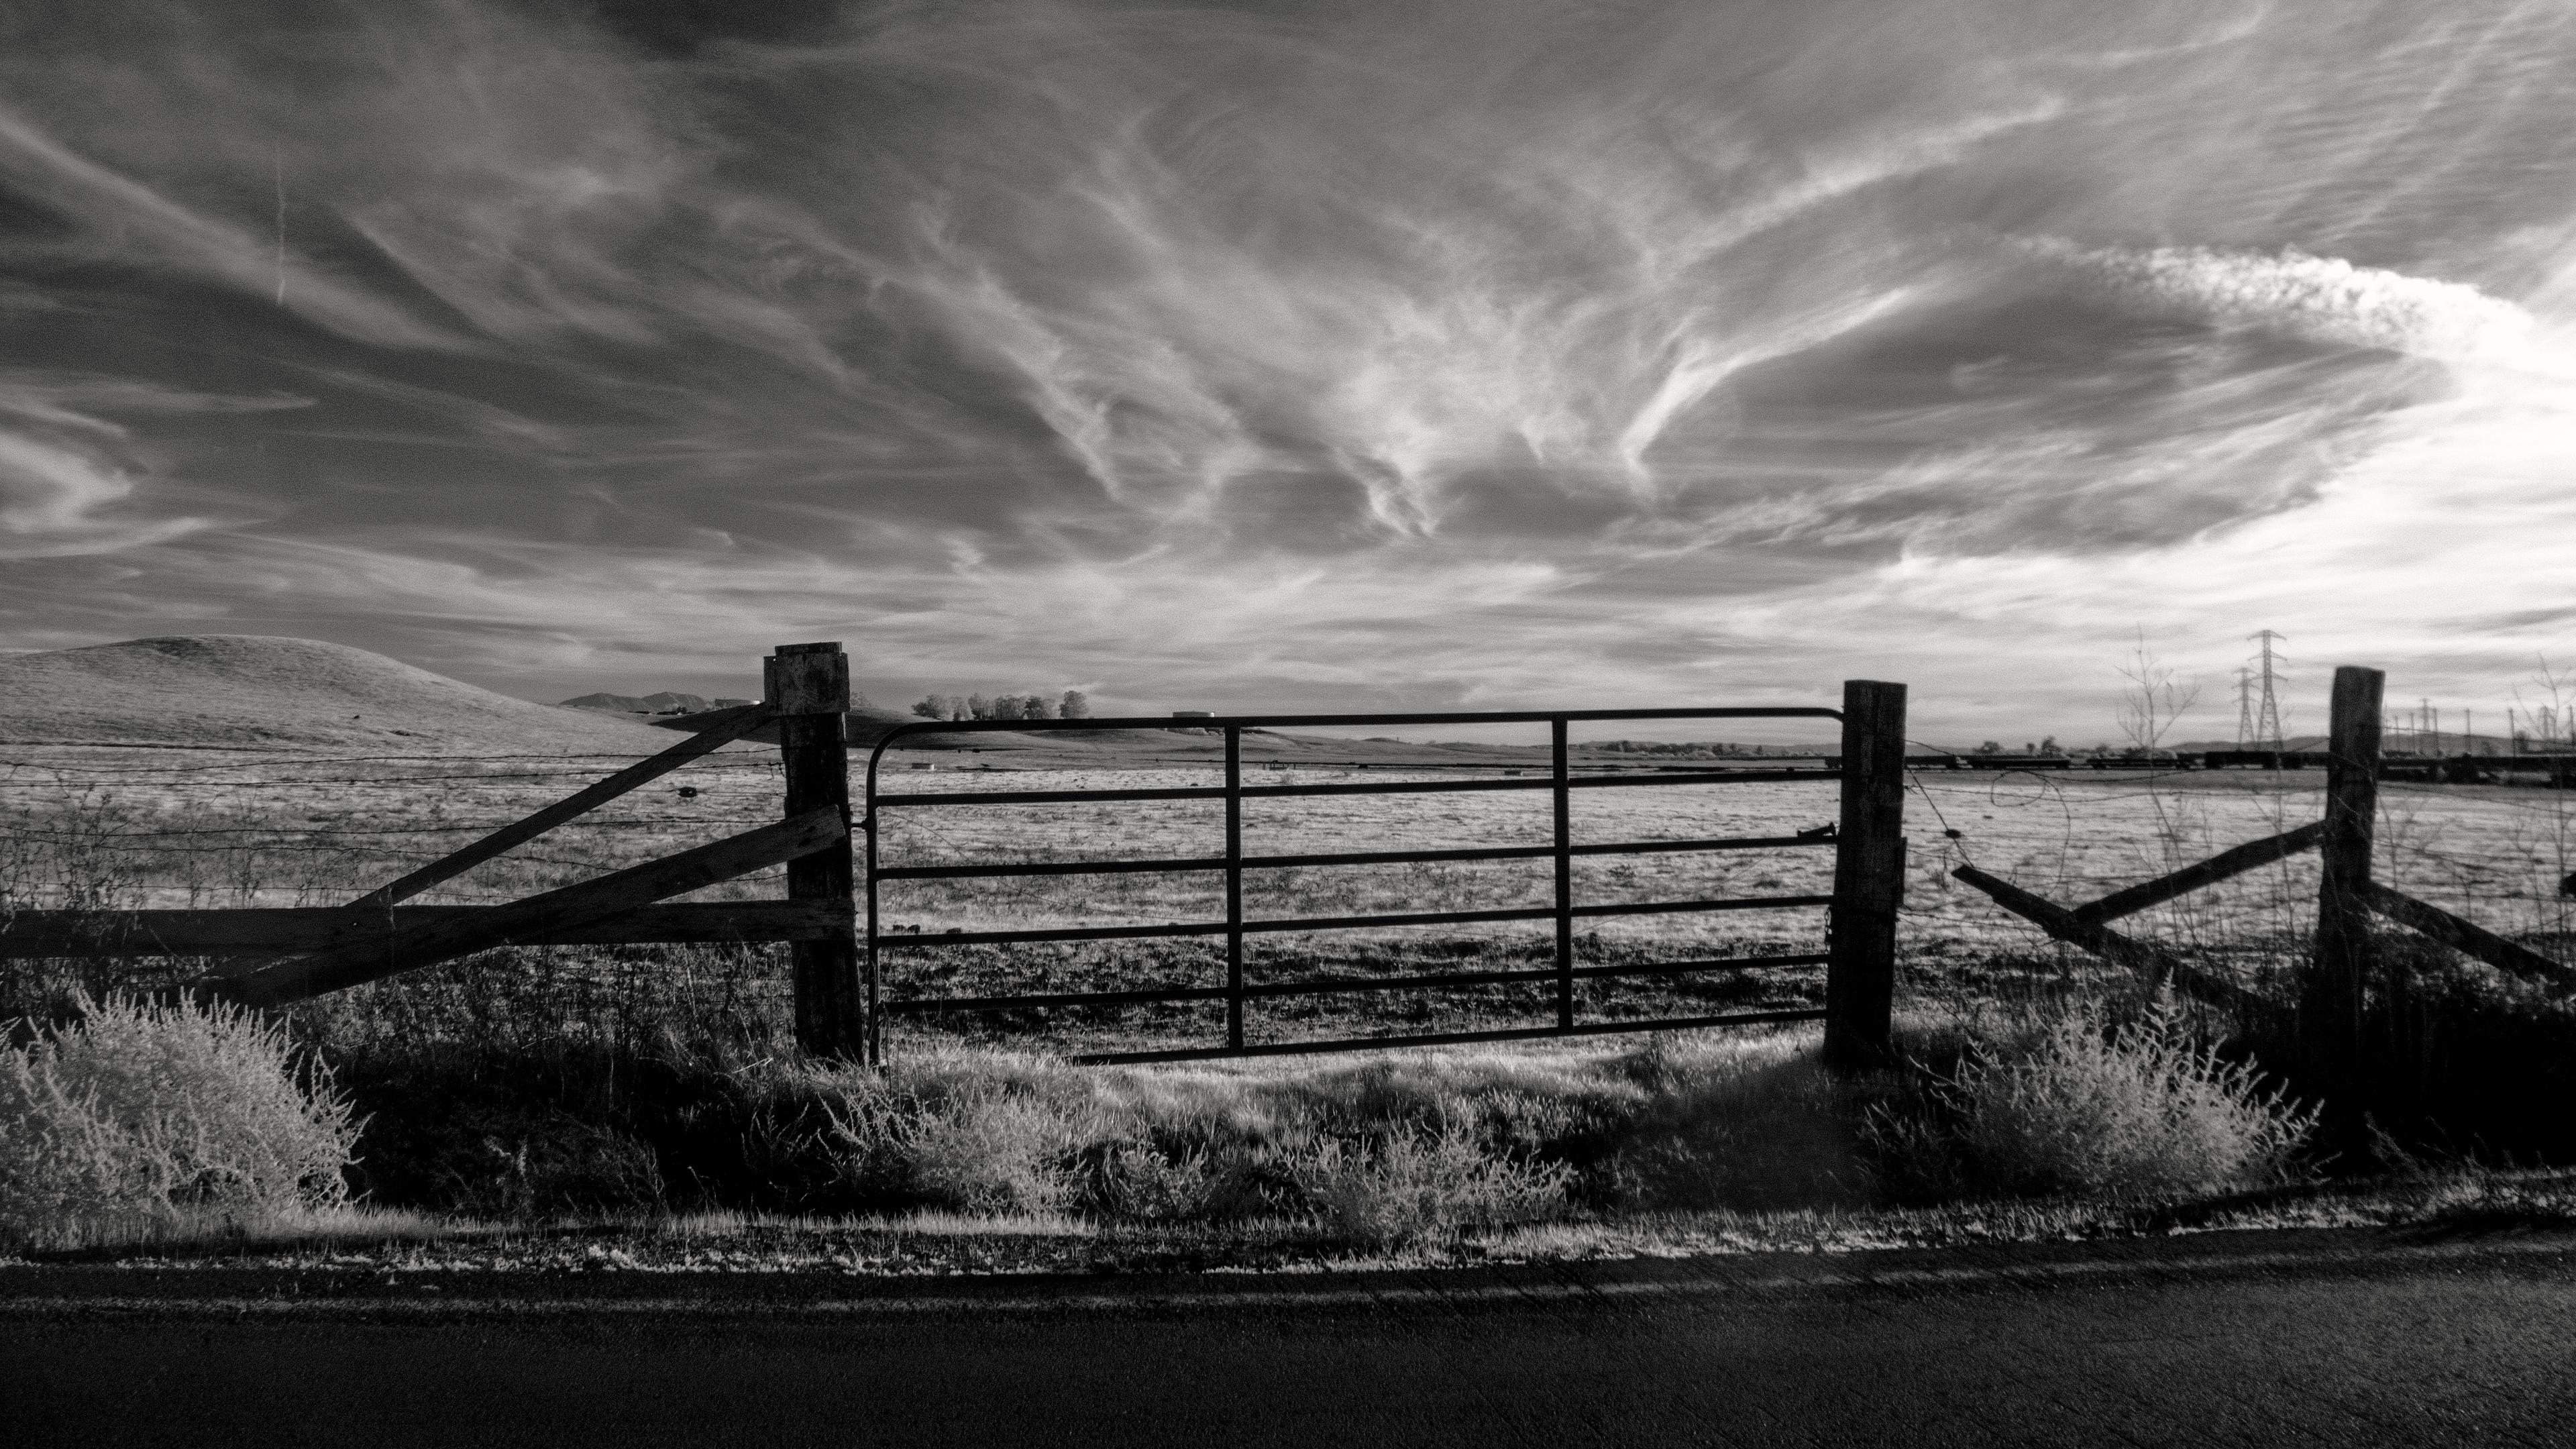 gate bw sky fence 4k 1541115417 - gate, bw, sky, fence 4k - Sky, Gate, bw